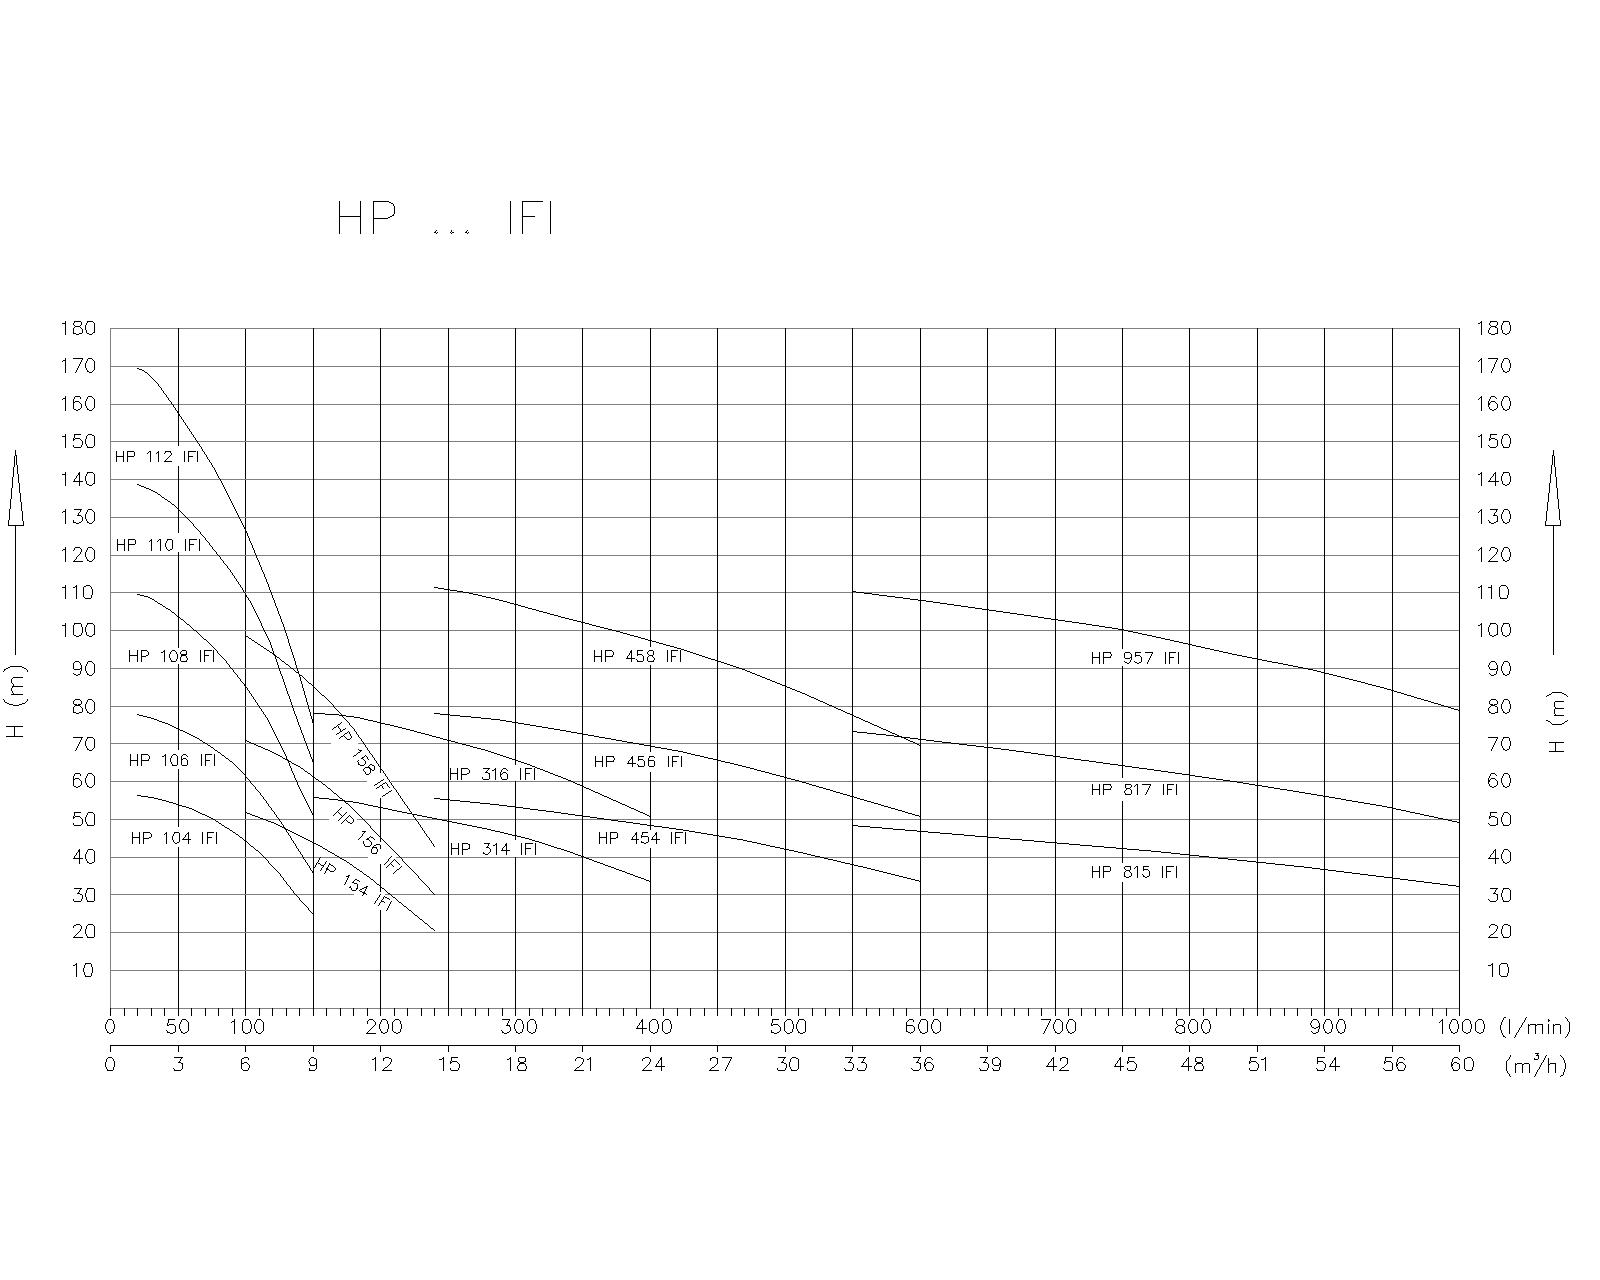 DIAGRAM Hidropostaje s frekvenčním regulatorjem tip HP_IF